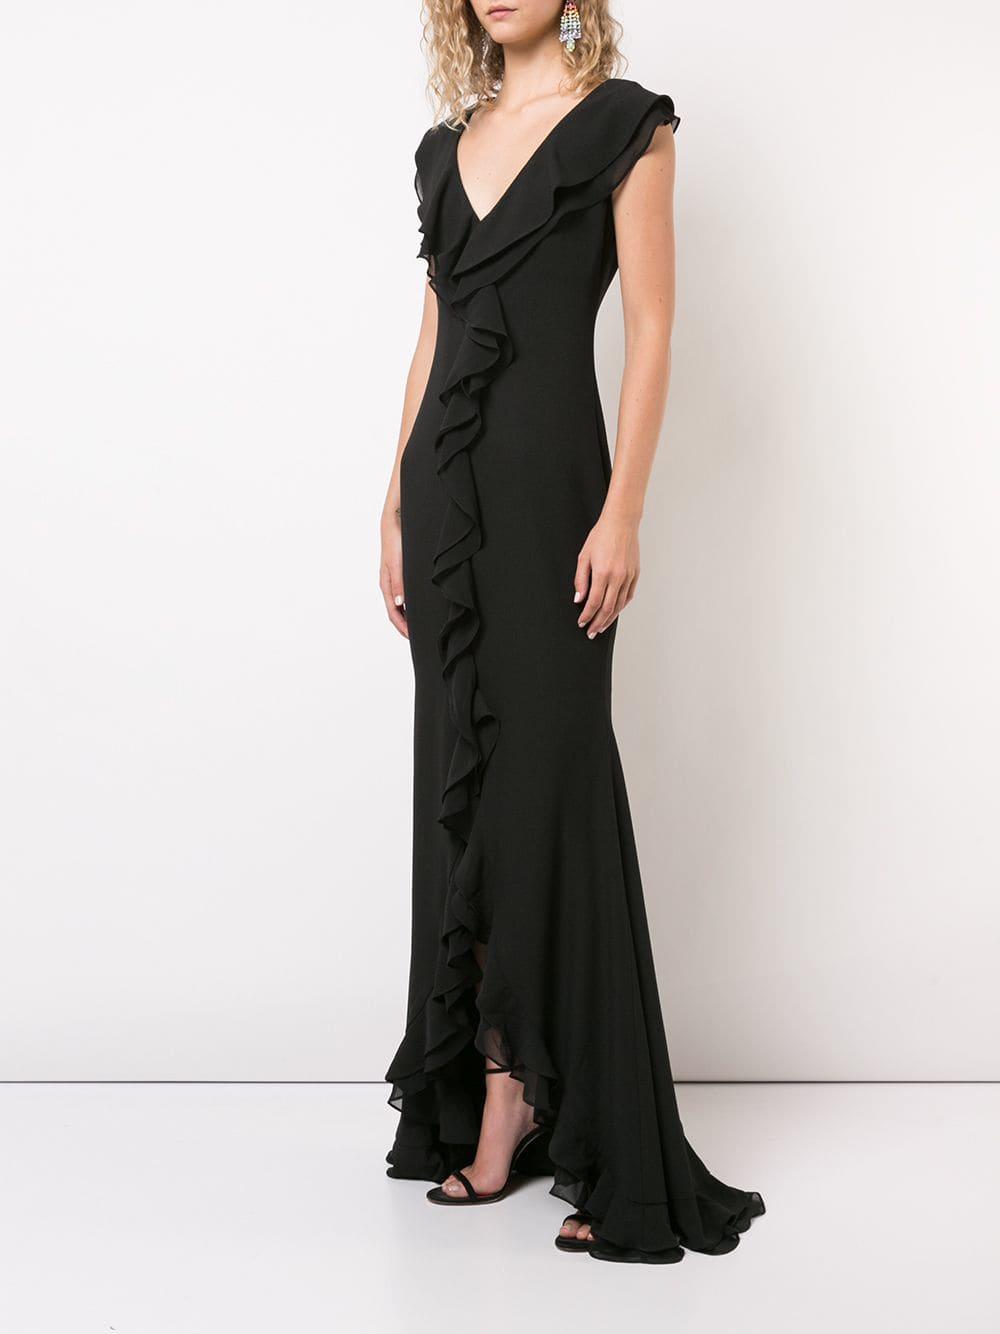 ZAC ZAC POSEN Aiden Black Gown - We Select Dresses